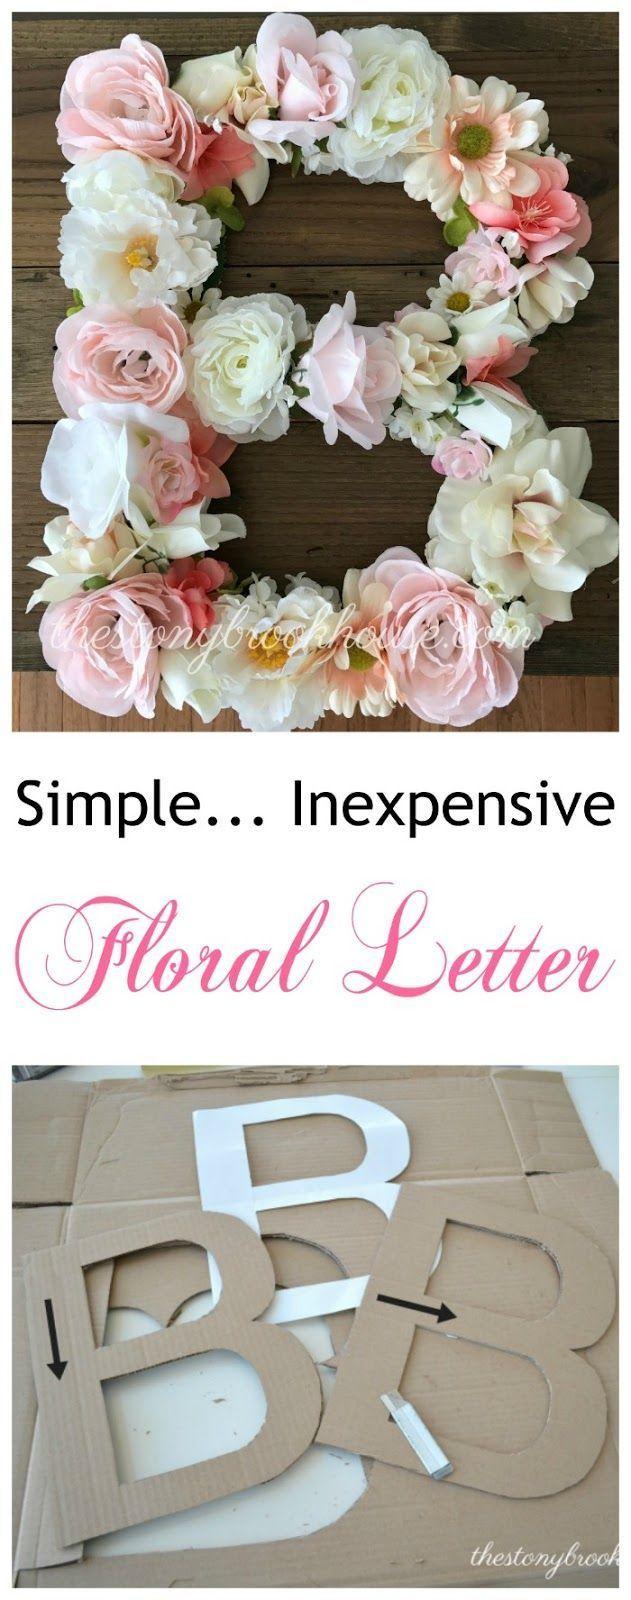 Simple Inexpensive Floral Letter ,  Arlene